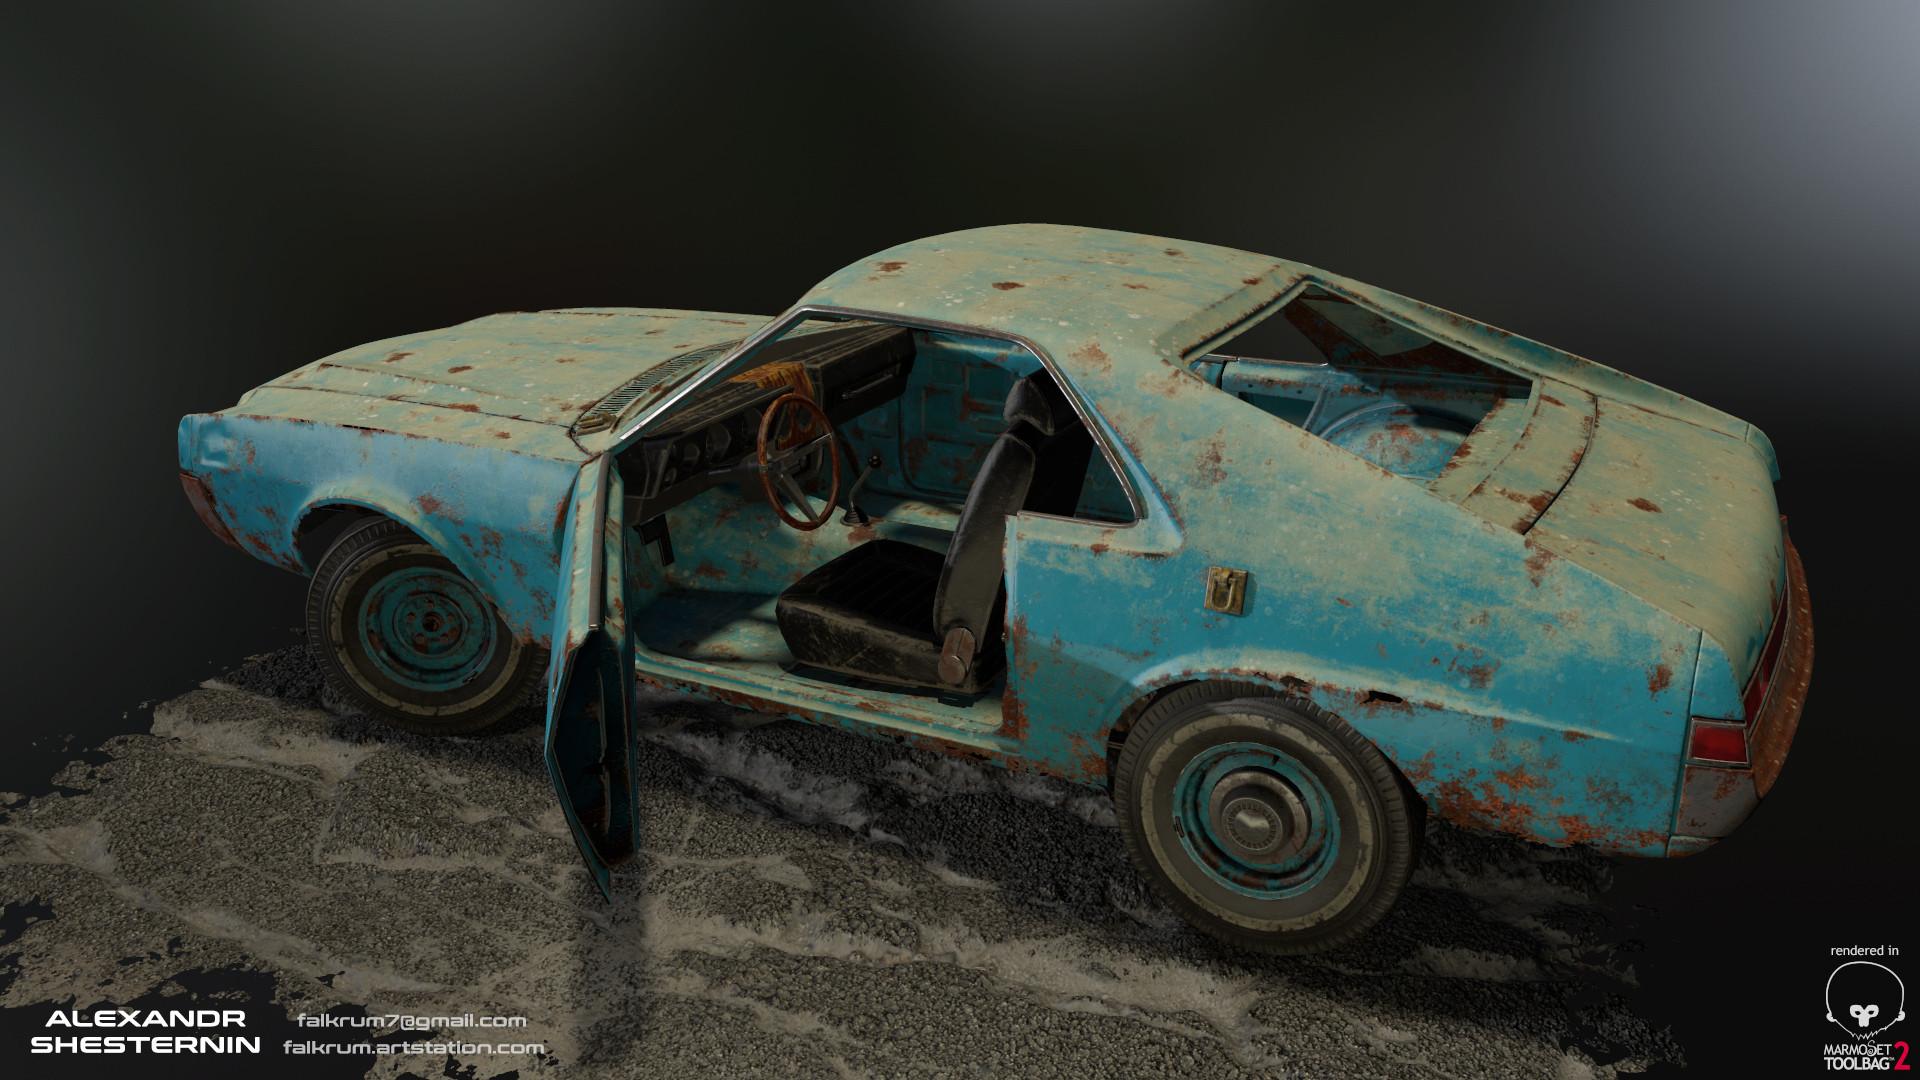 Alexandr shesternin modular abandoned car03